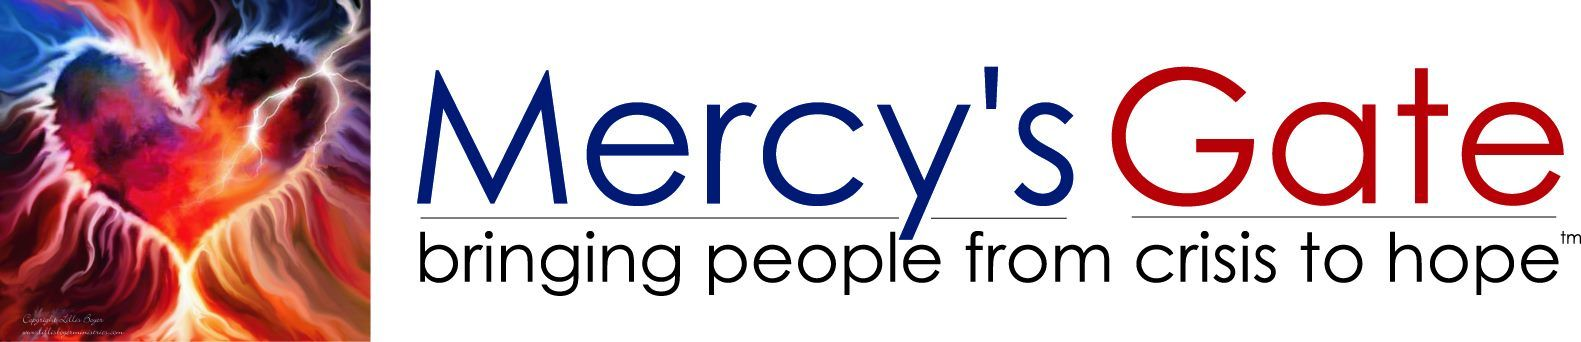 Mercy's Gate